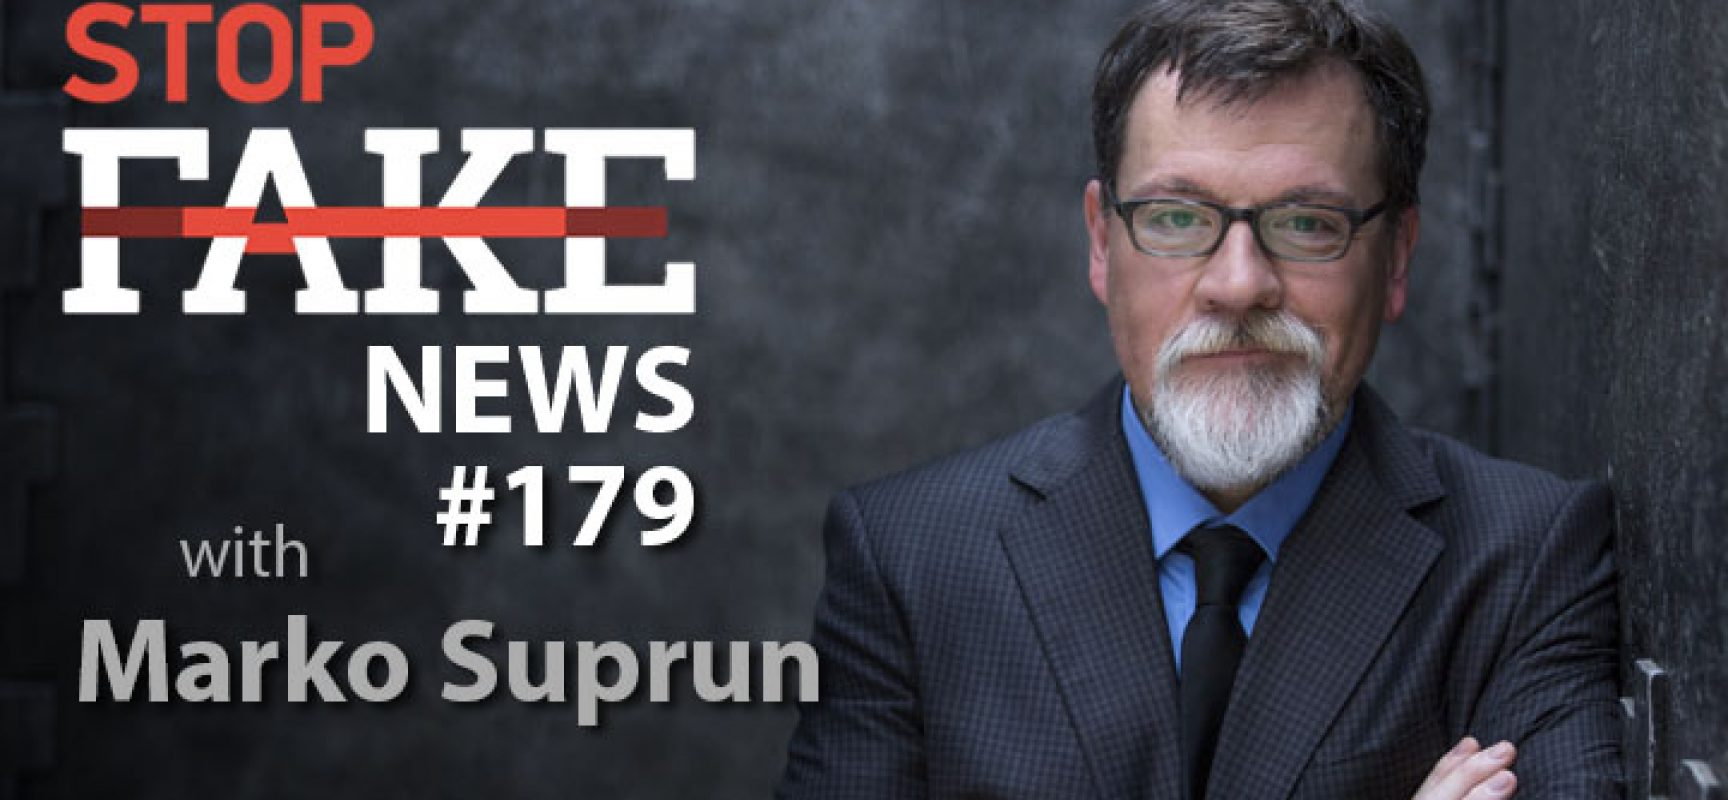 StopFake #179 con Marko Suprun